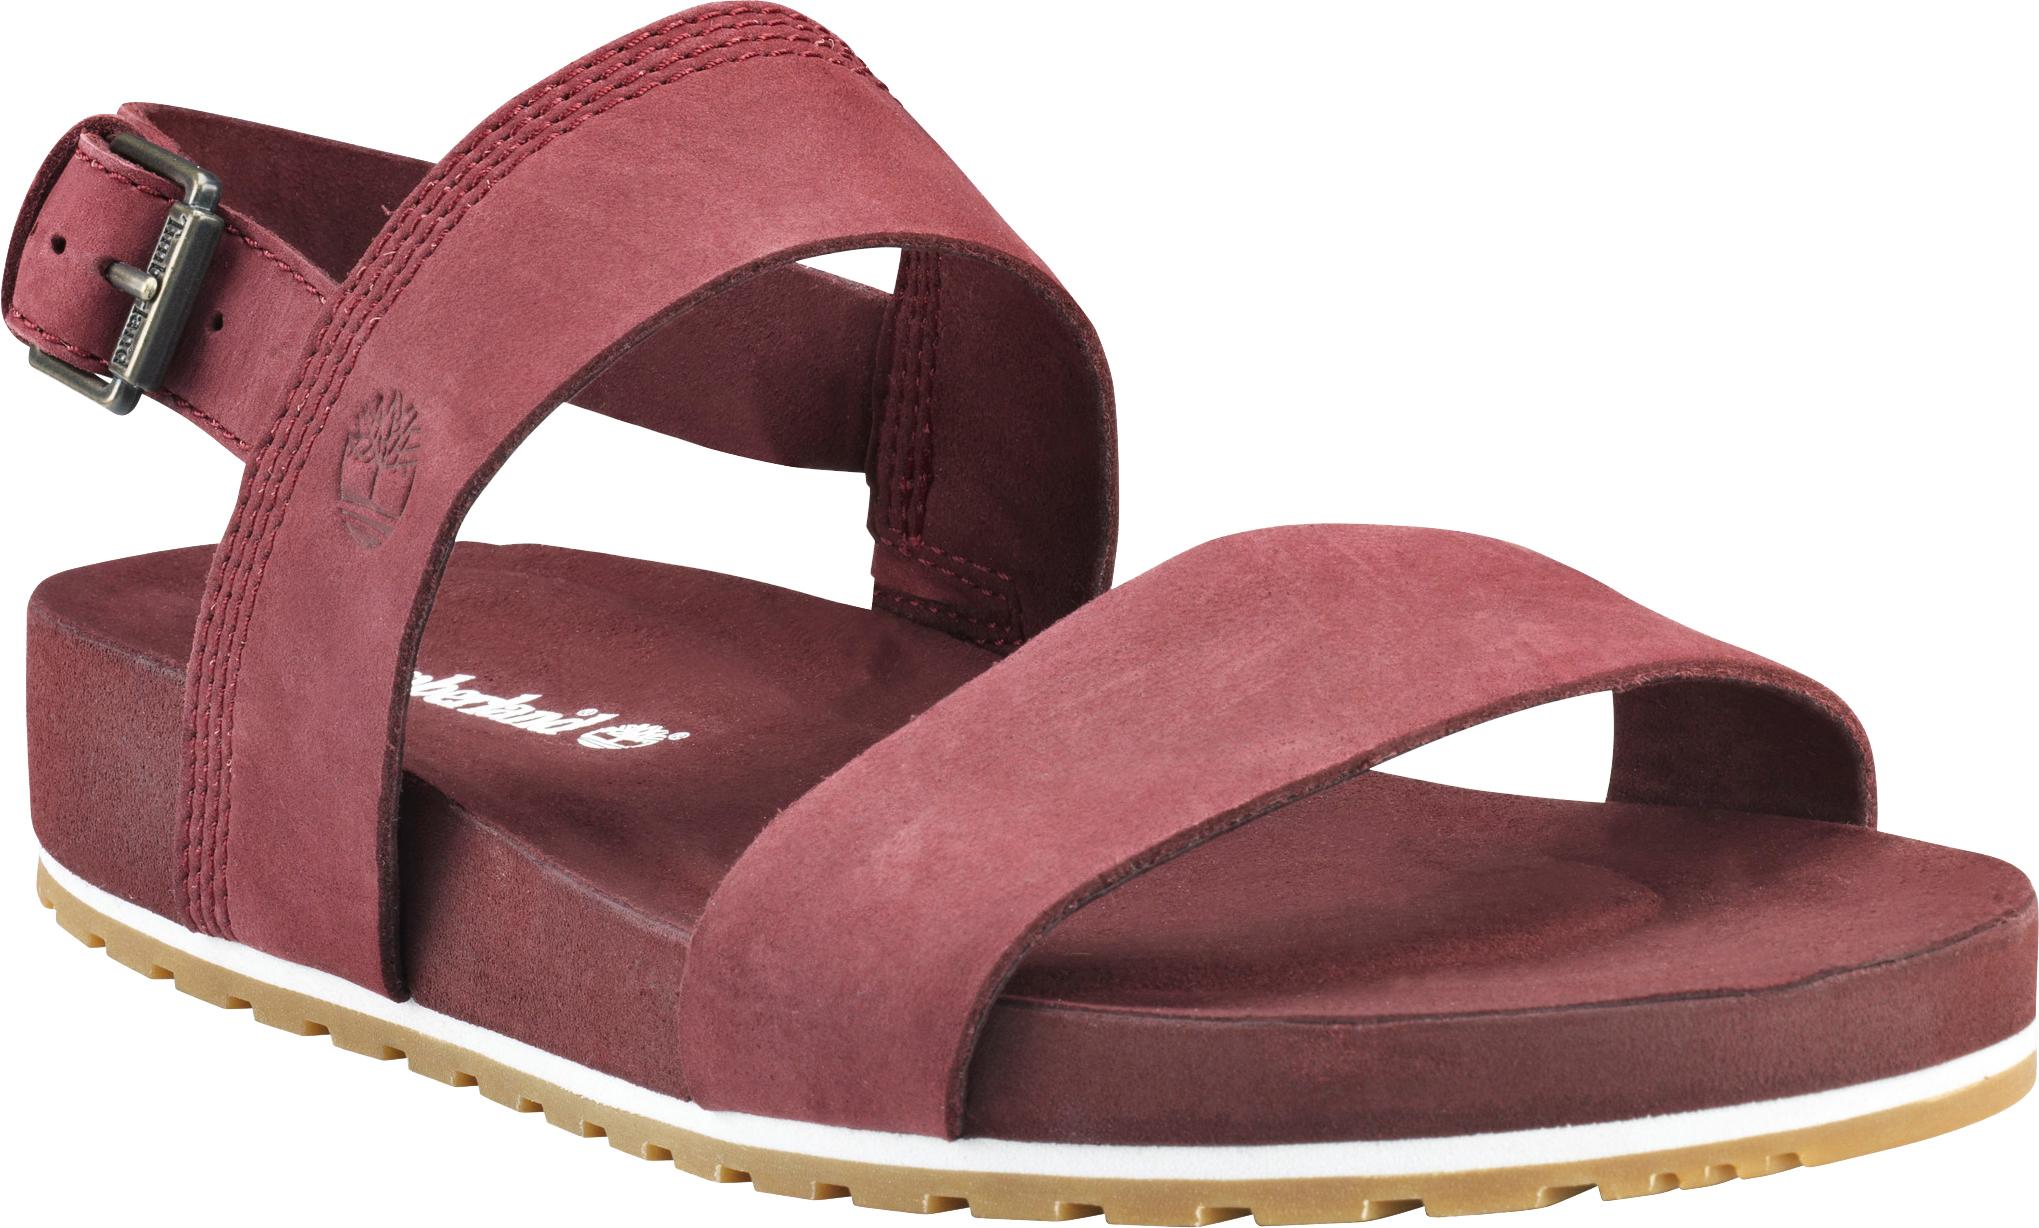 Podrido Motivar barro  Timberland Malibu Waves Two Band Sandals - Women's | MEC